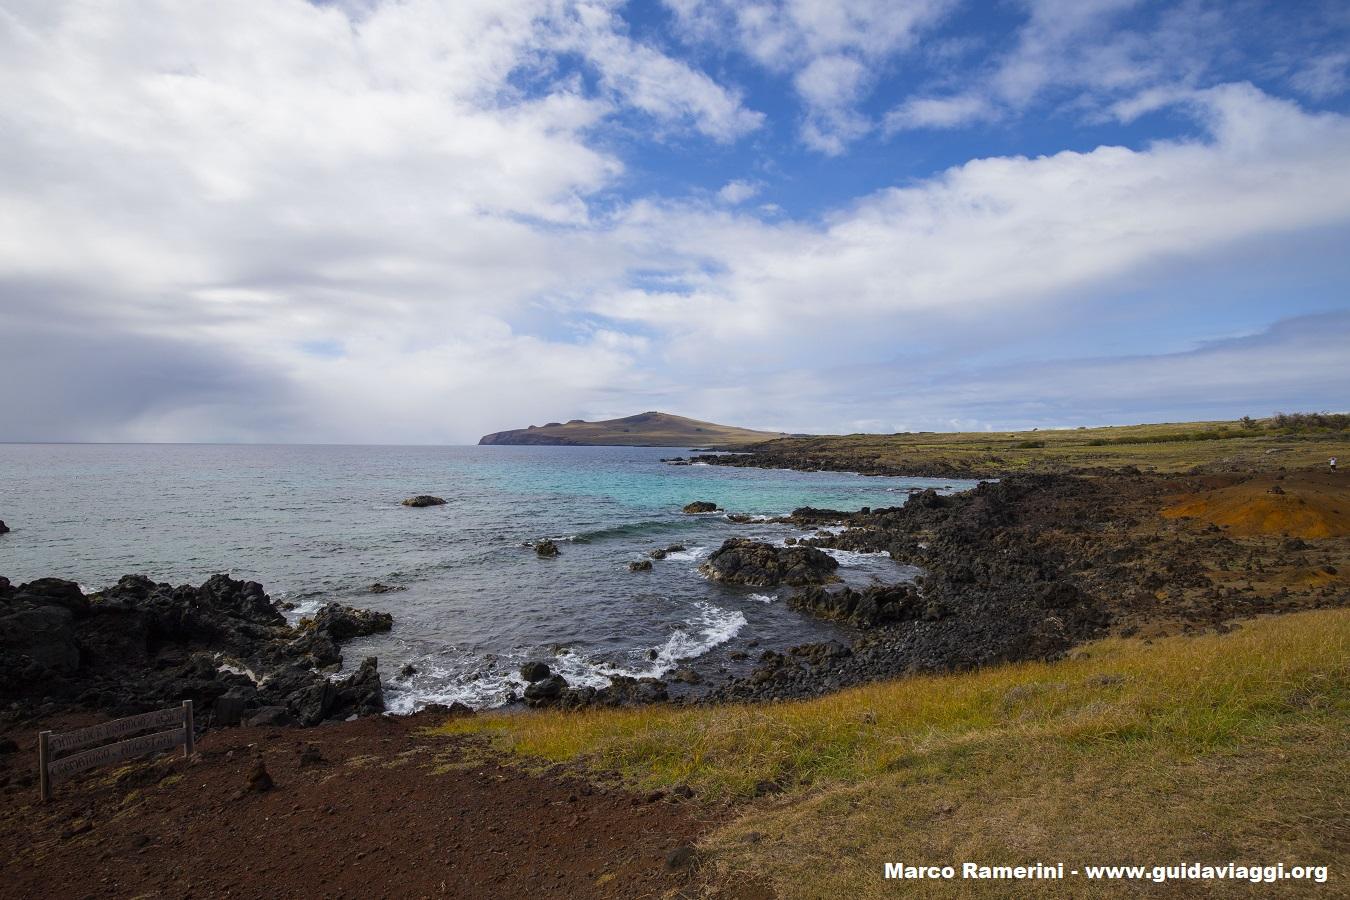 A costa norte da ilha vista de Ovahe, Ilha de Páscoa, Chile. Autor e Copyright Marco Ramerini.